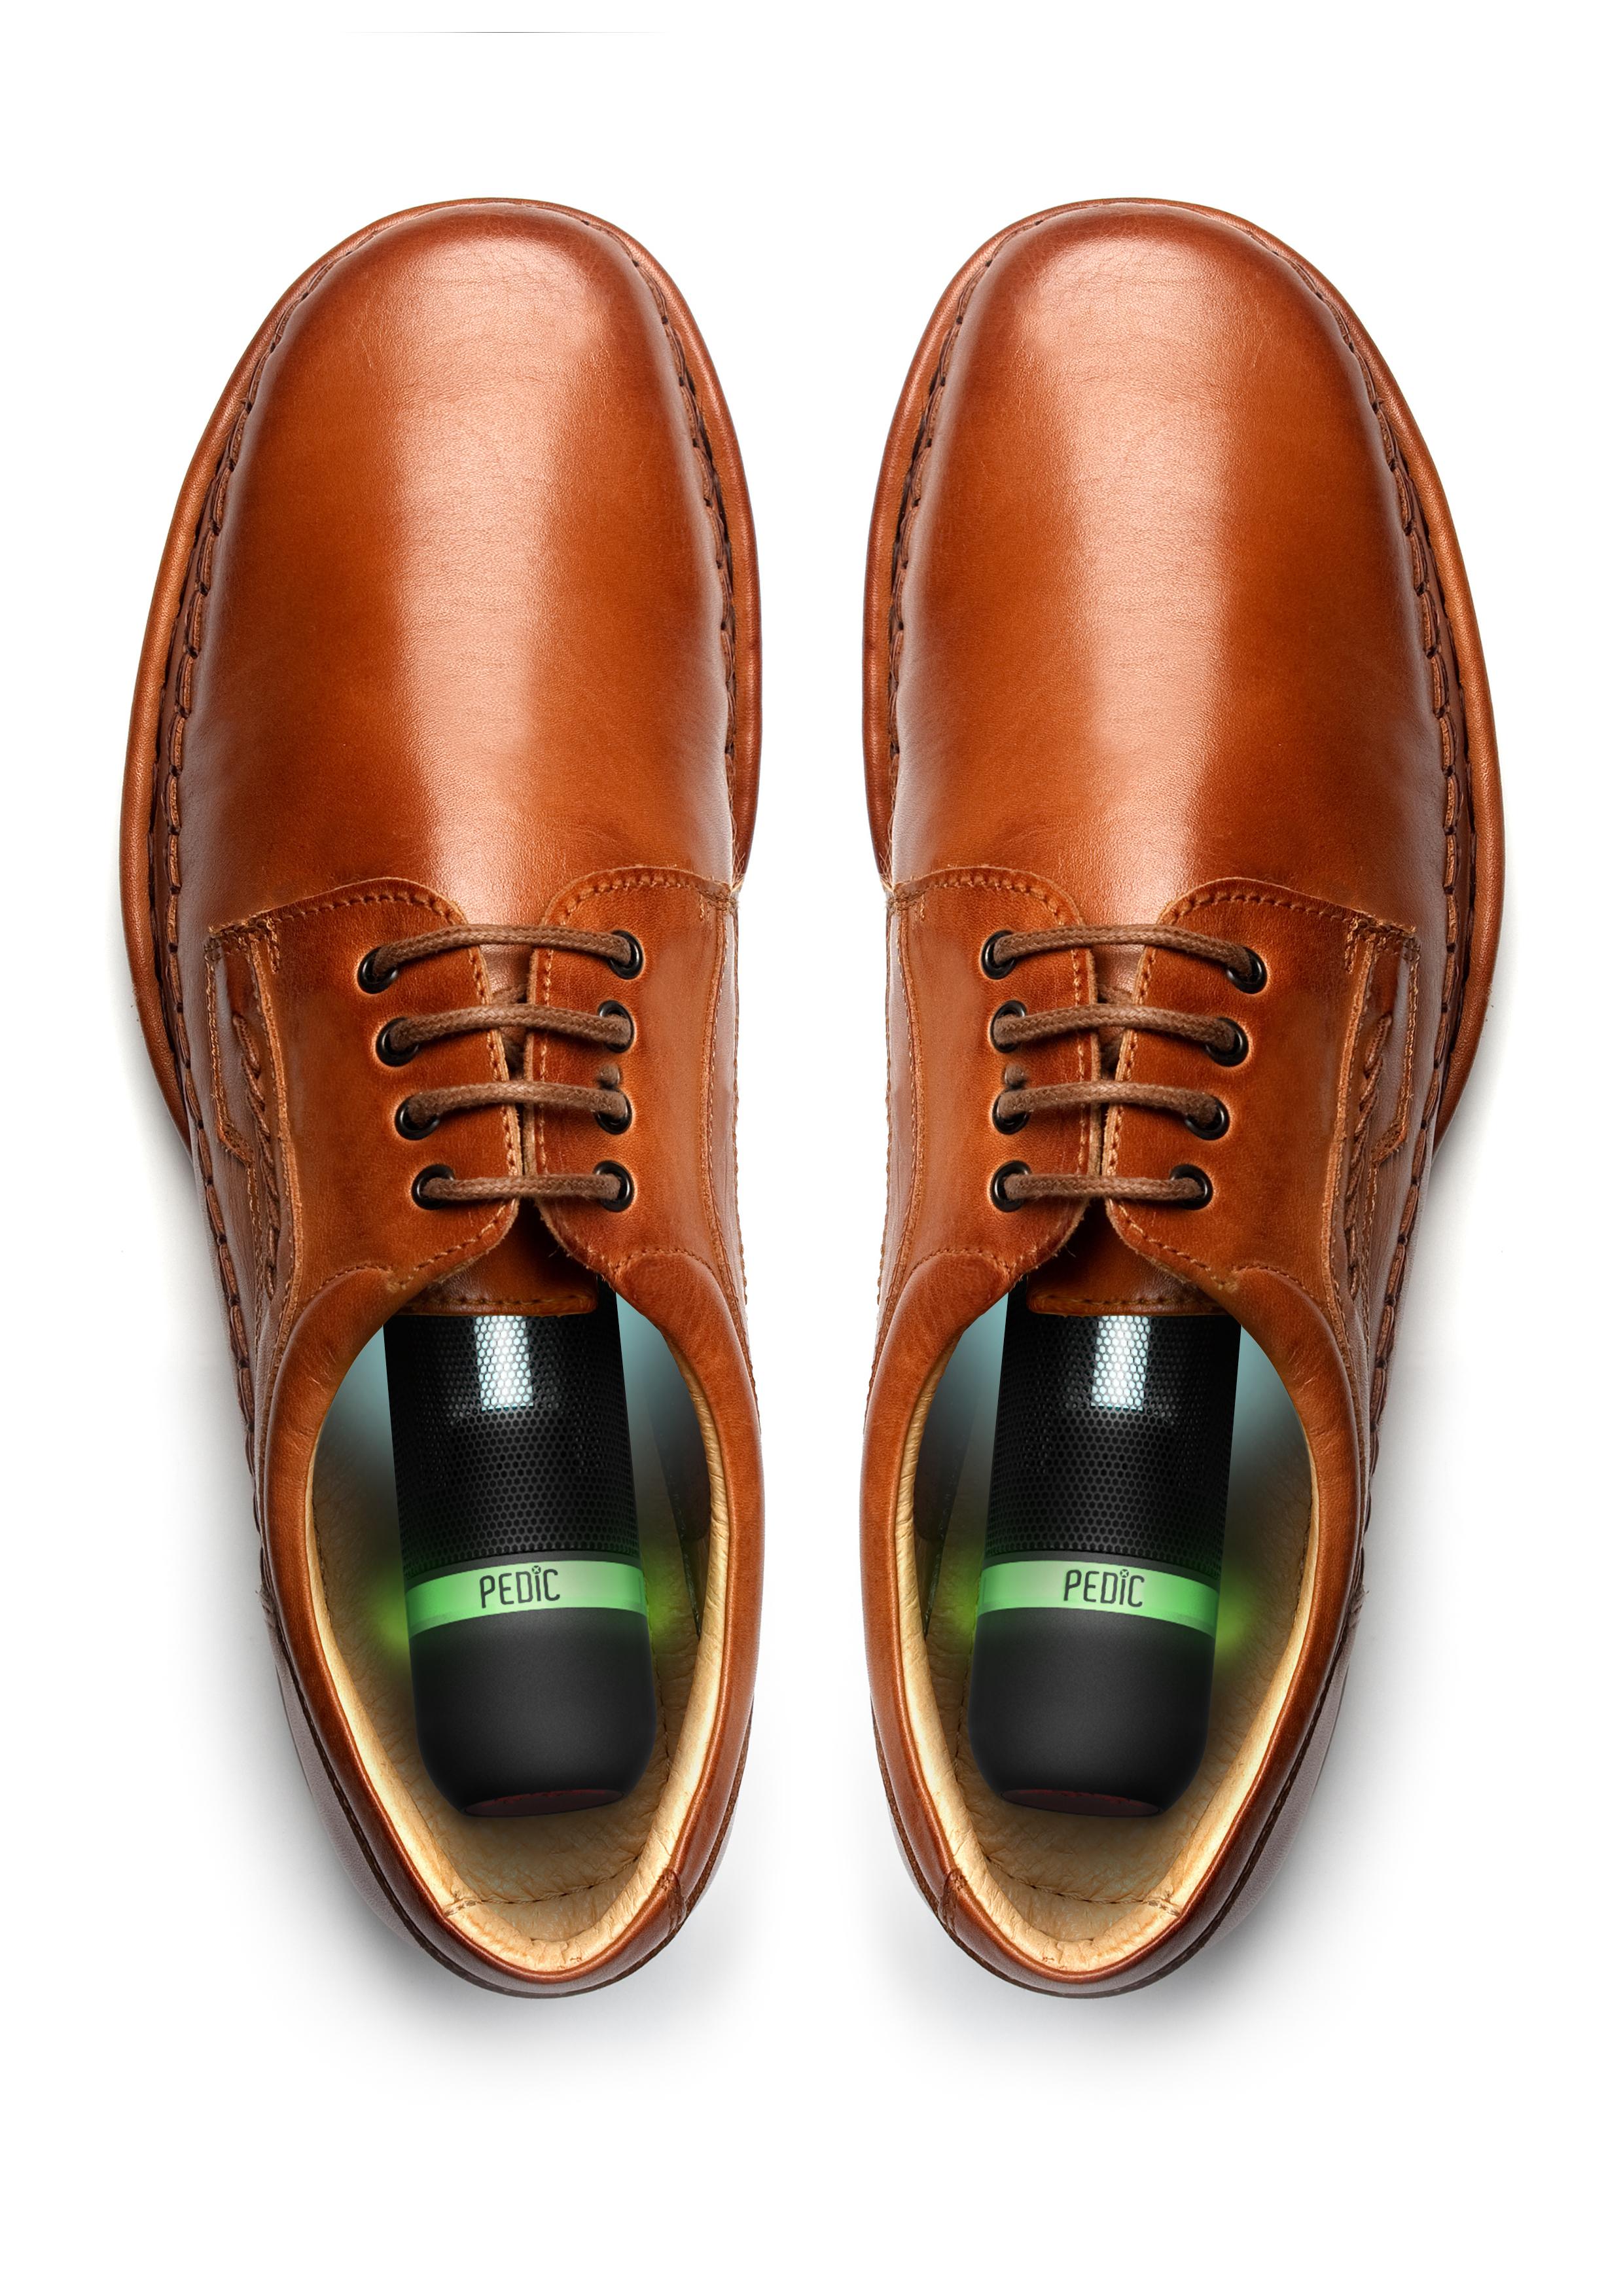 Pedic V2 Shoe